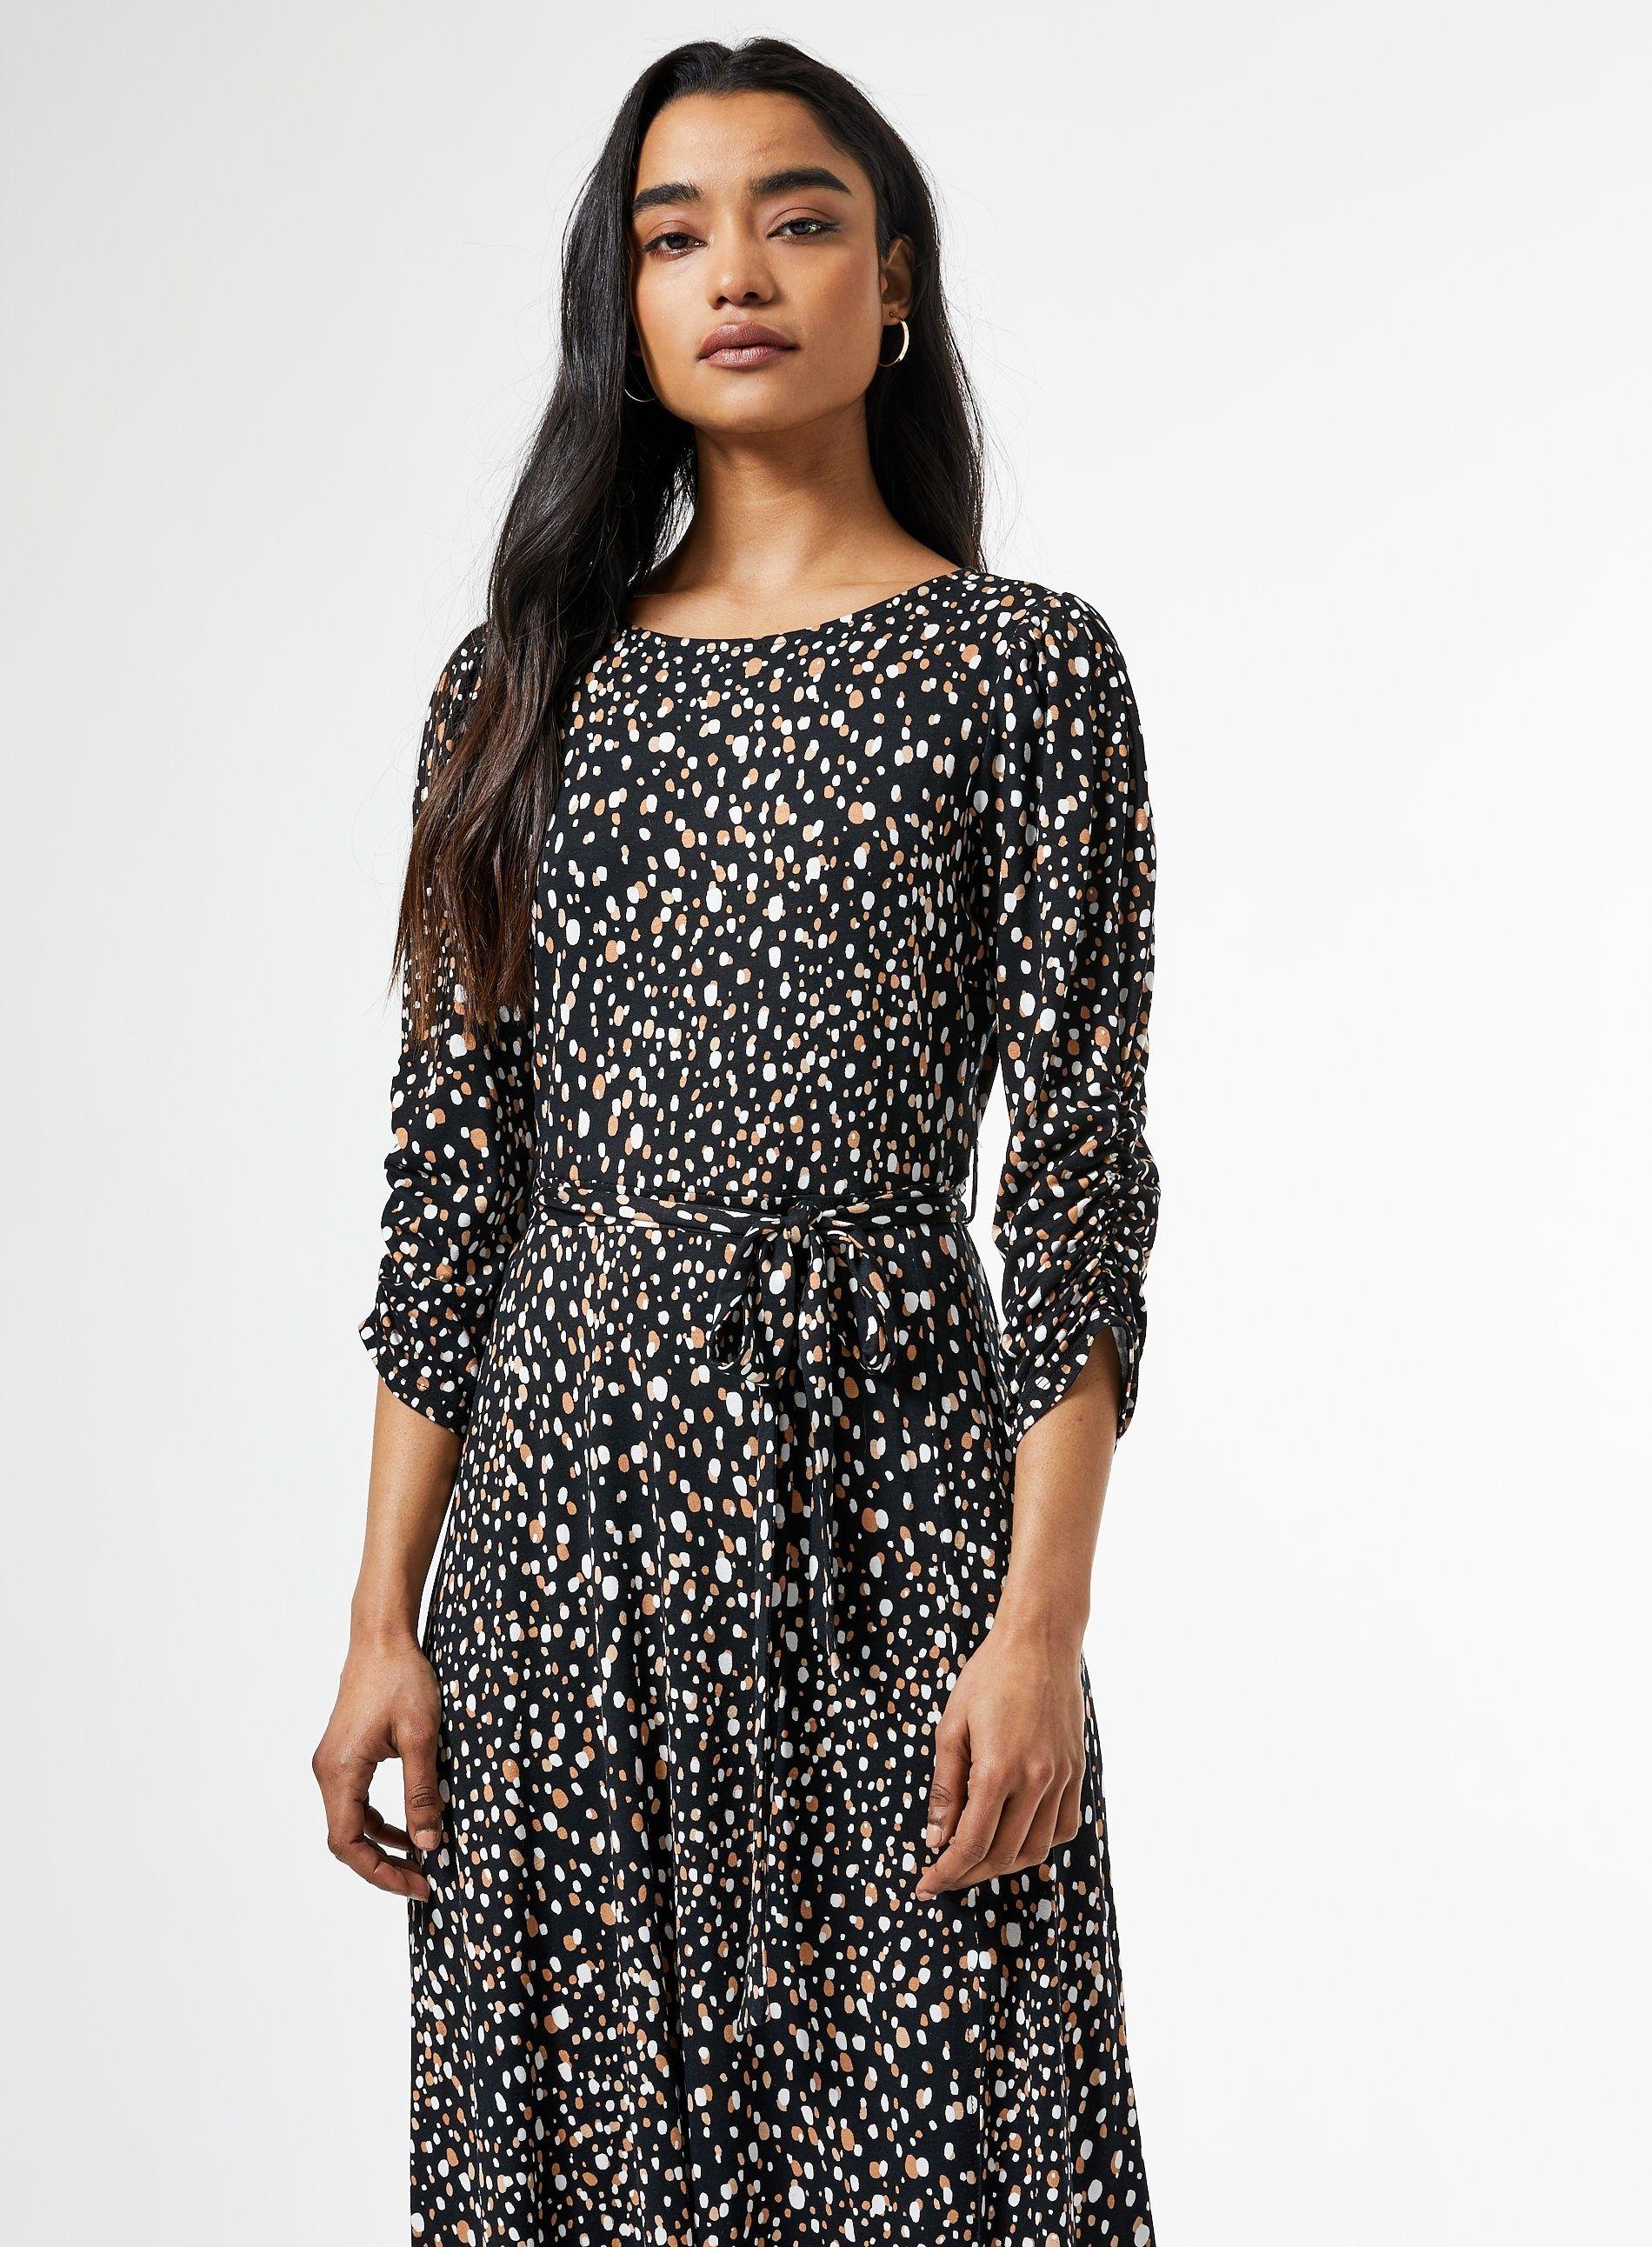 Dorothy Perkins Womens Petite Black Spot Print Midi Dress Boat Neck Polka Dot